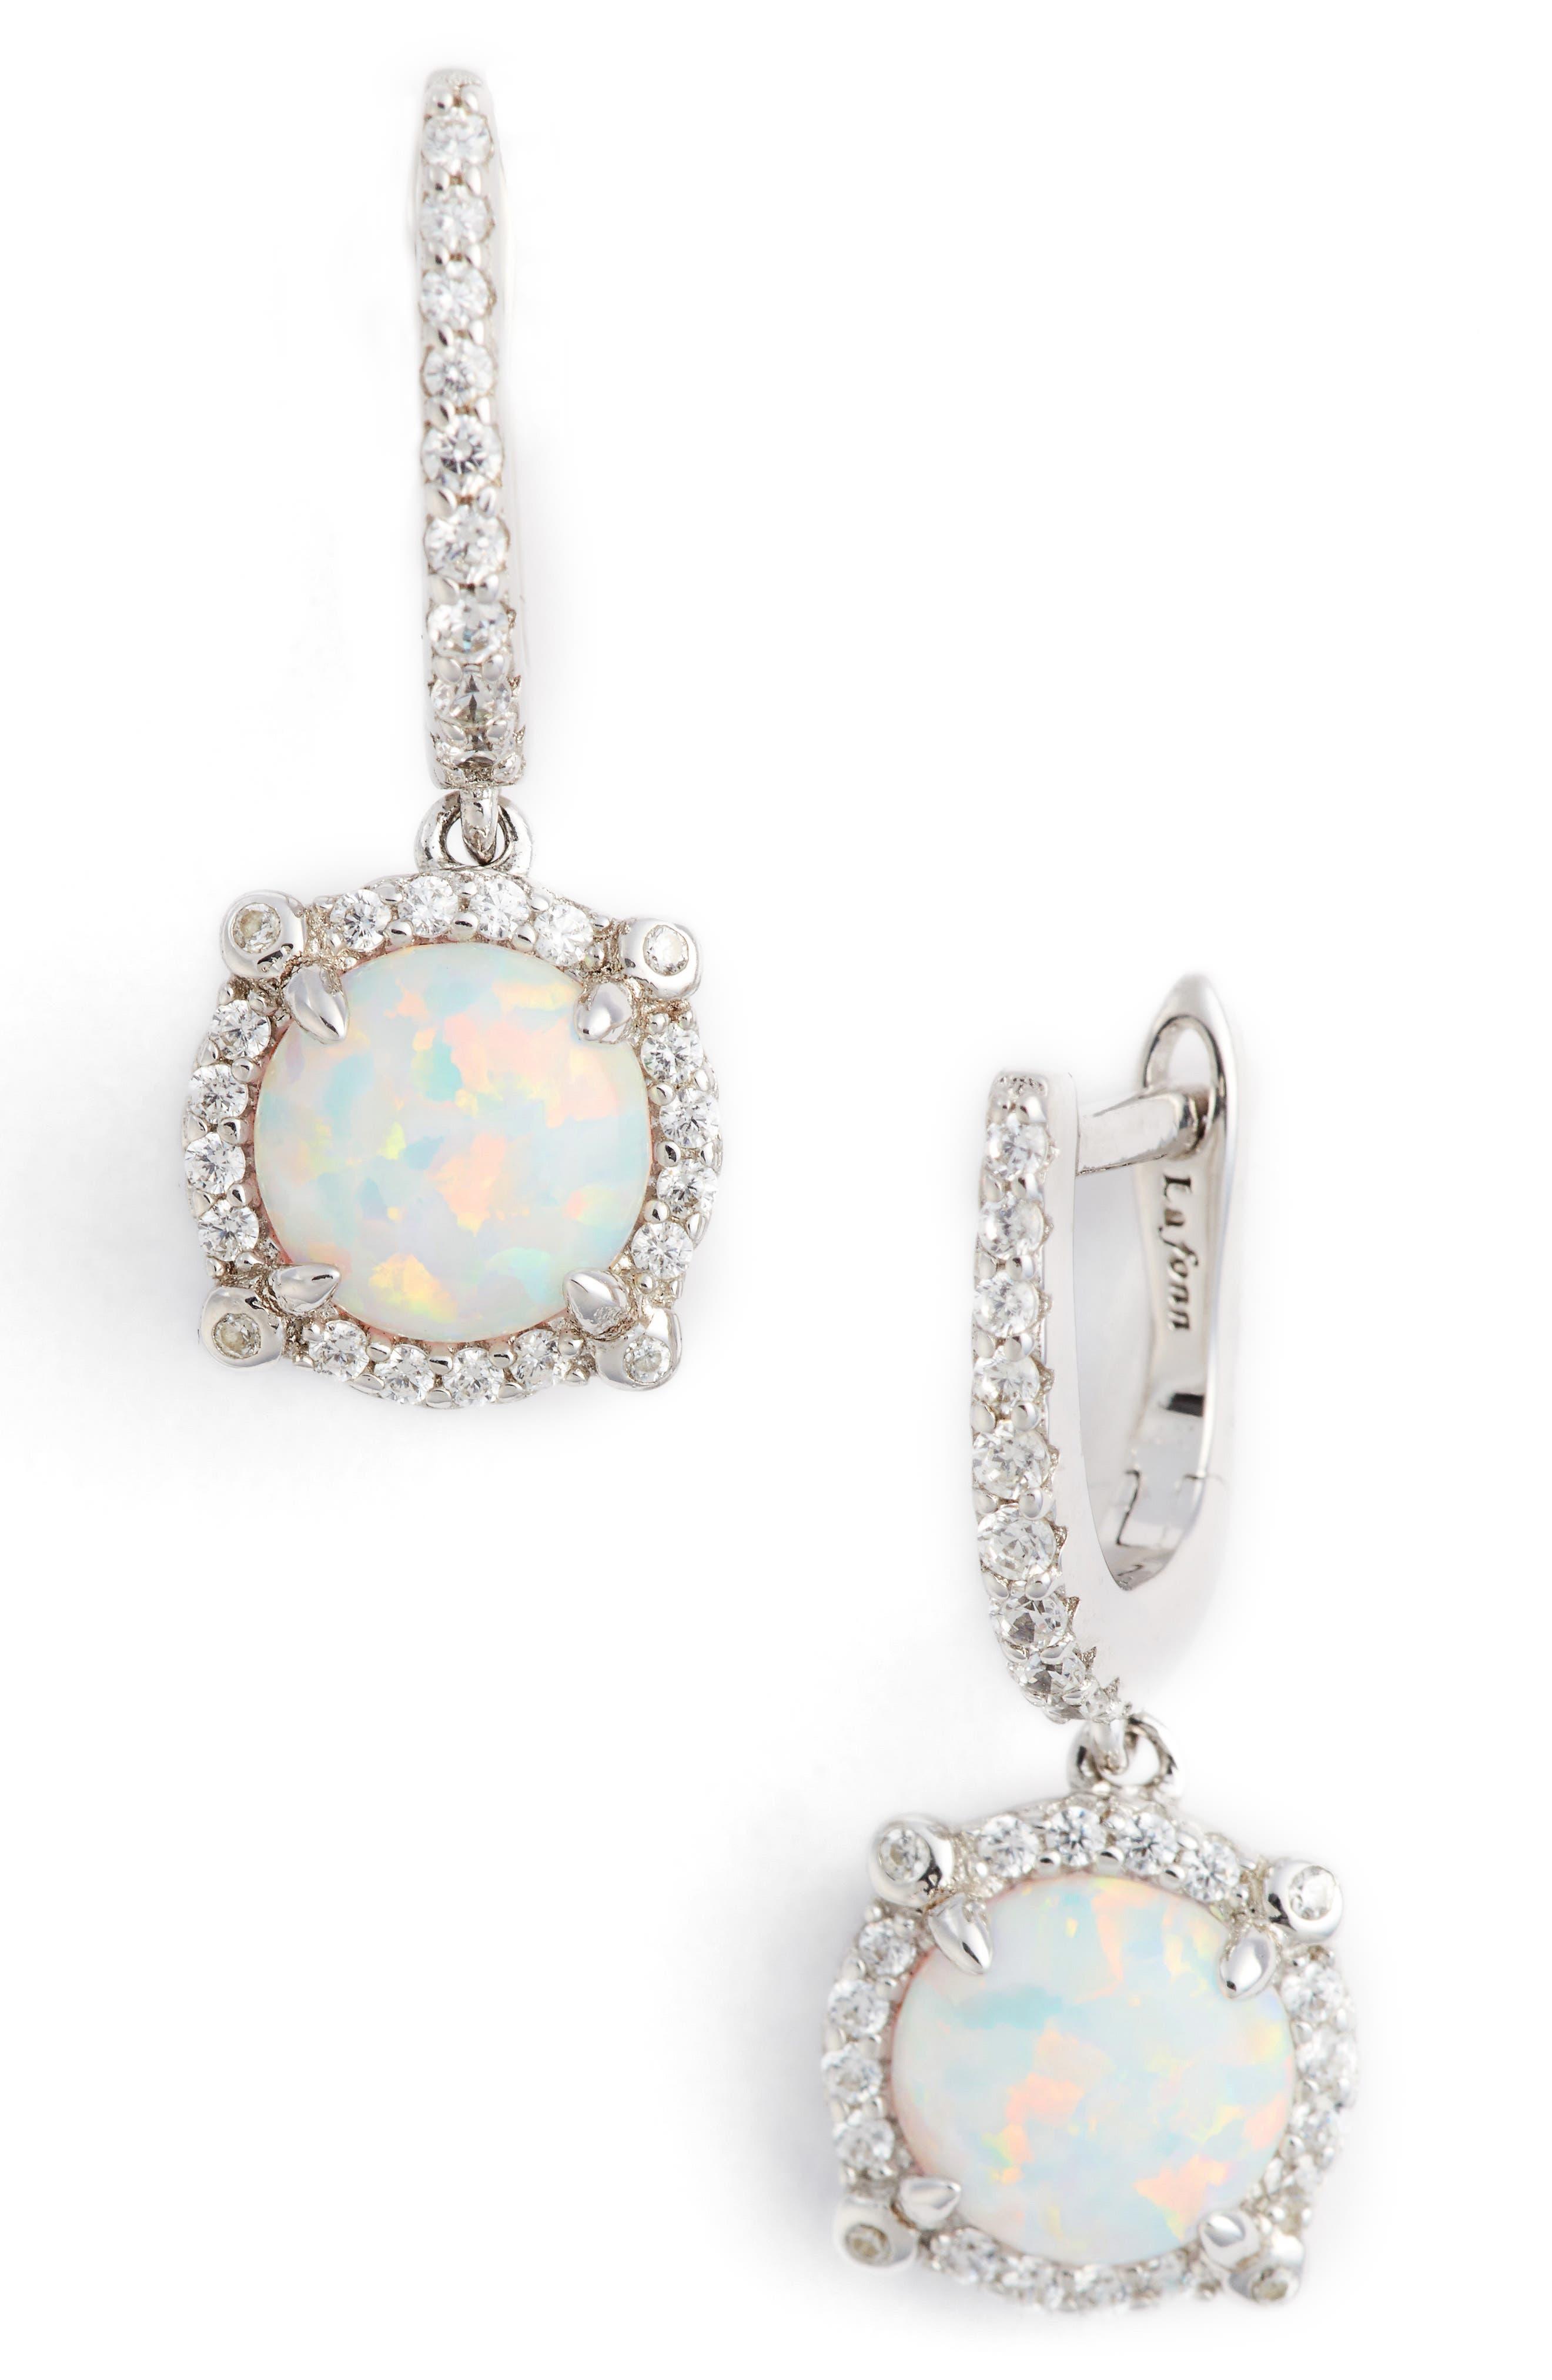 Simulated Diamond Drop Earrings,                             Main thumbnail 1, color,                             SILVER/ OPAL/ CLEAR